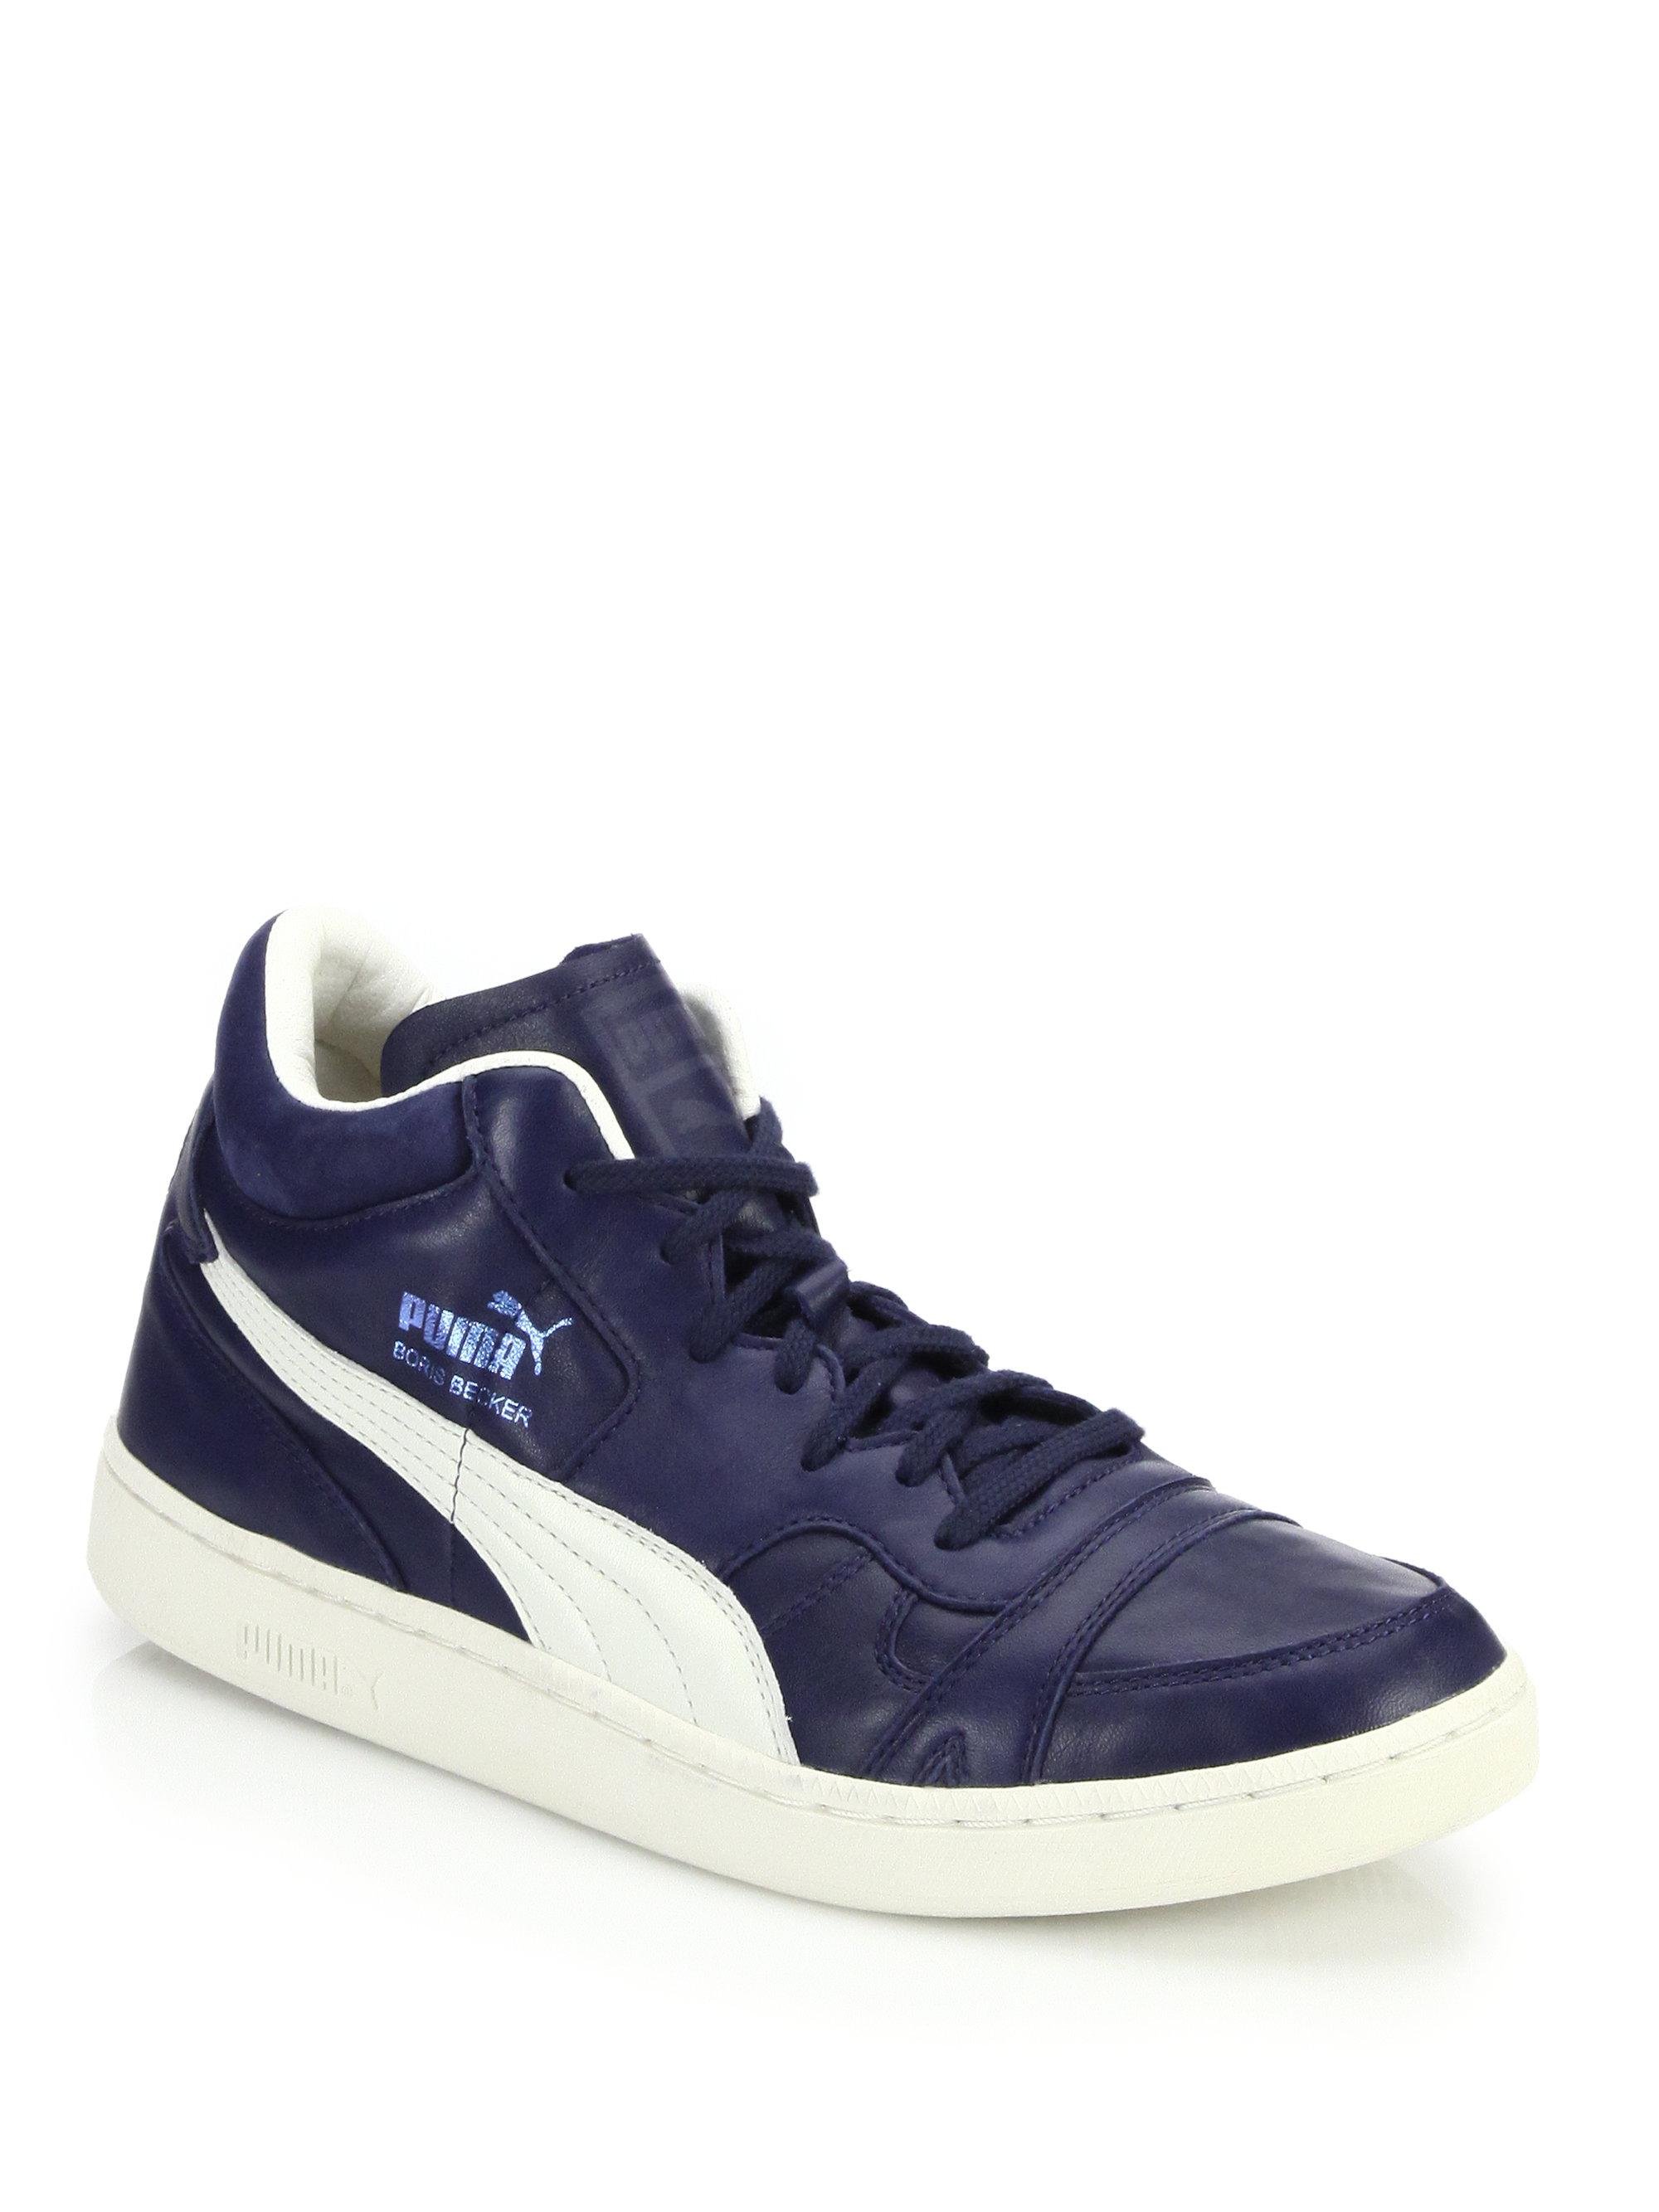 Lyst - PUMA Becker Leather High-top Sneakers in Blue 12d56af813ec